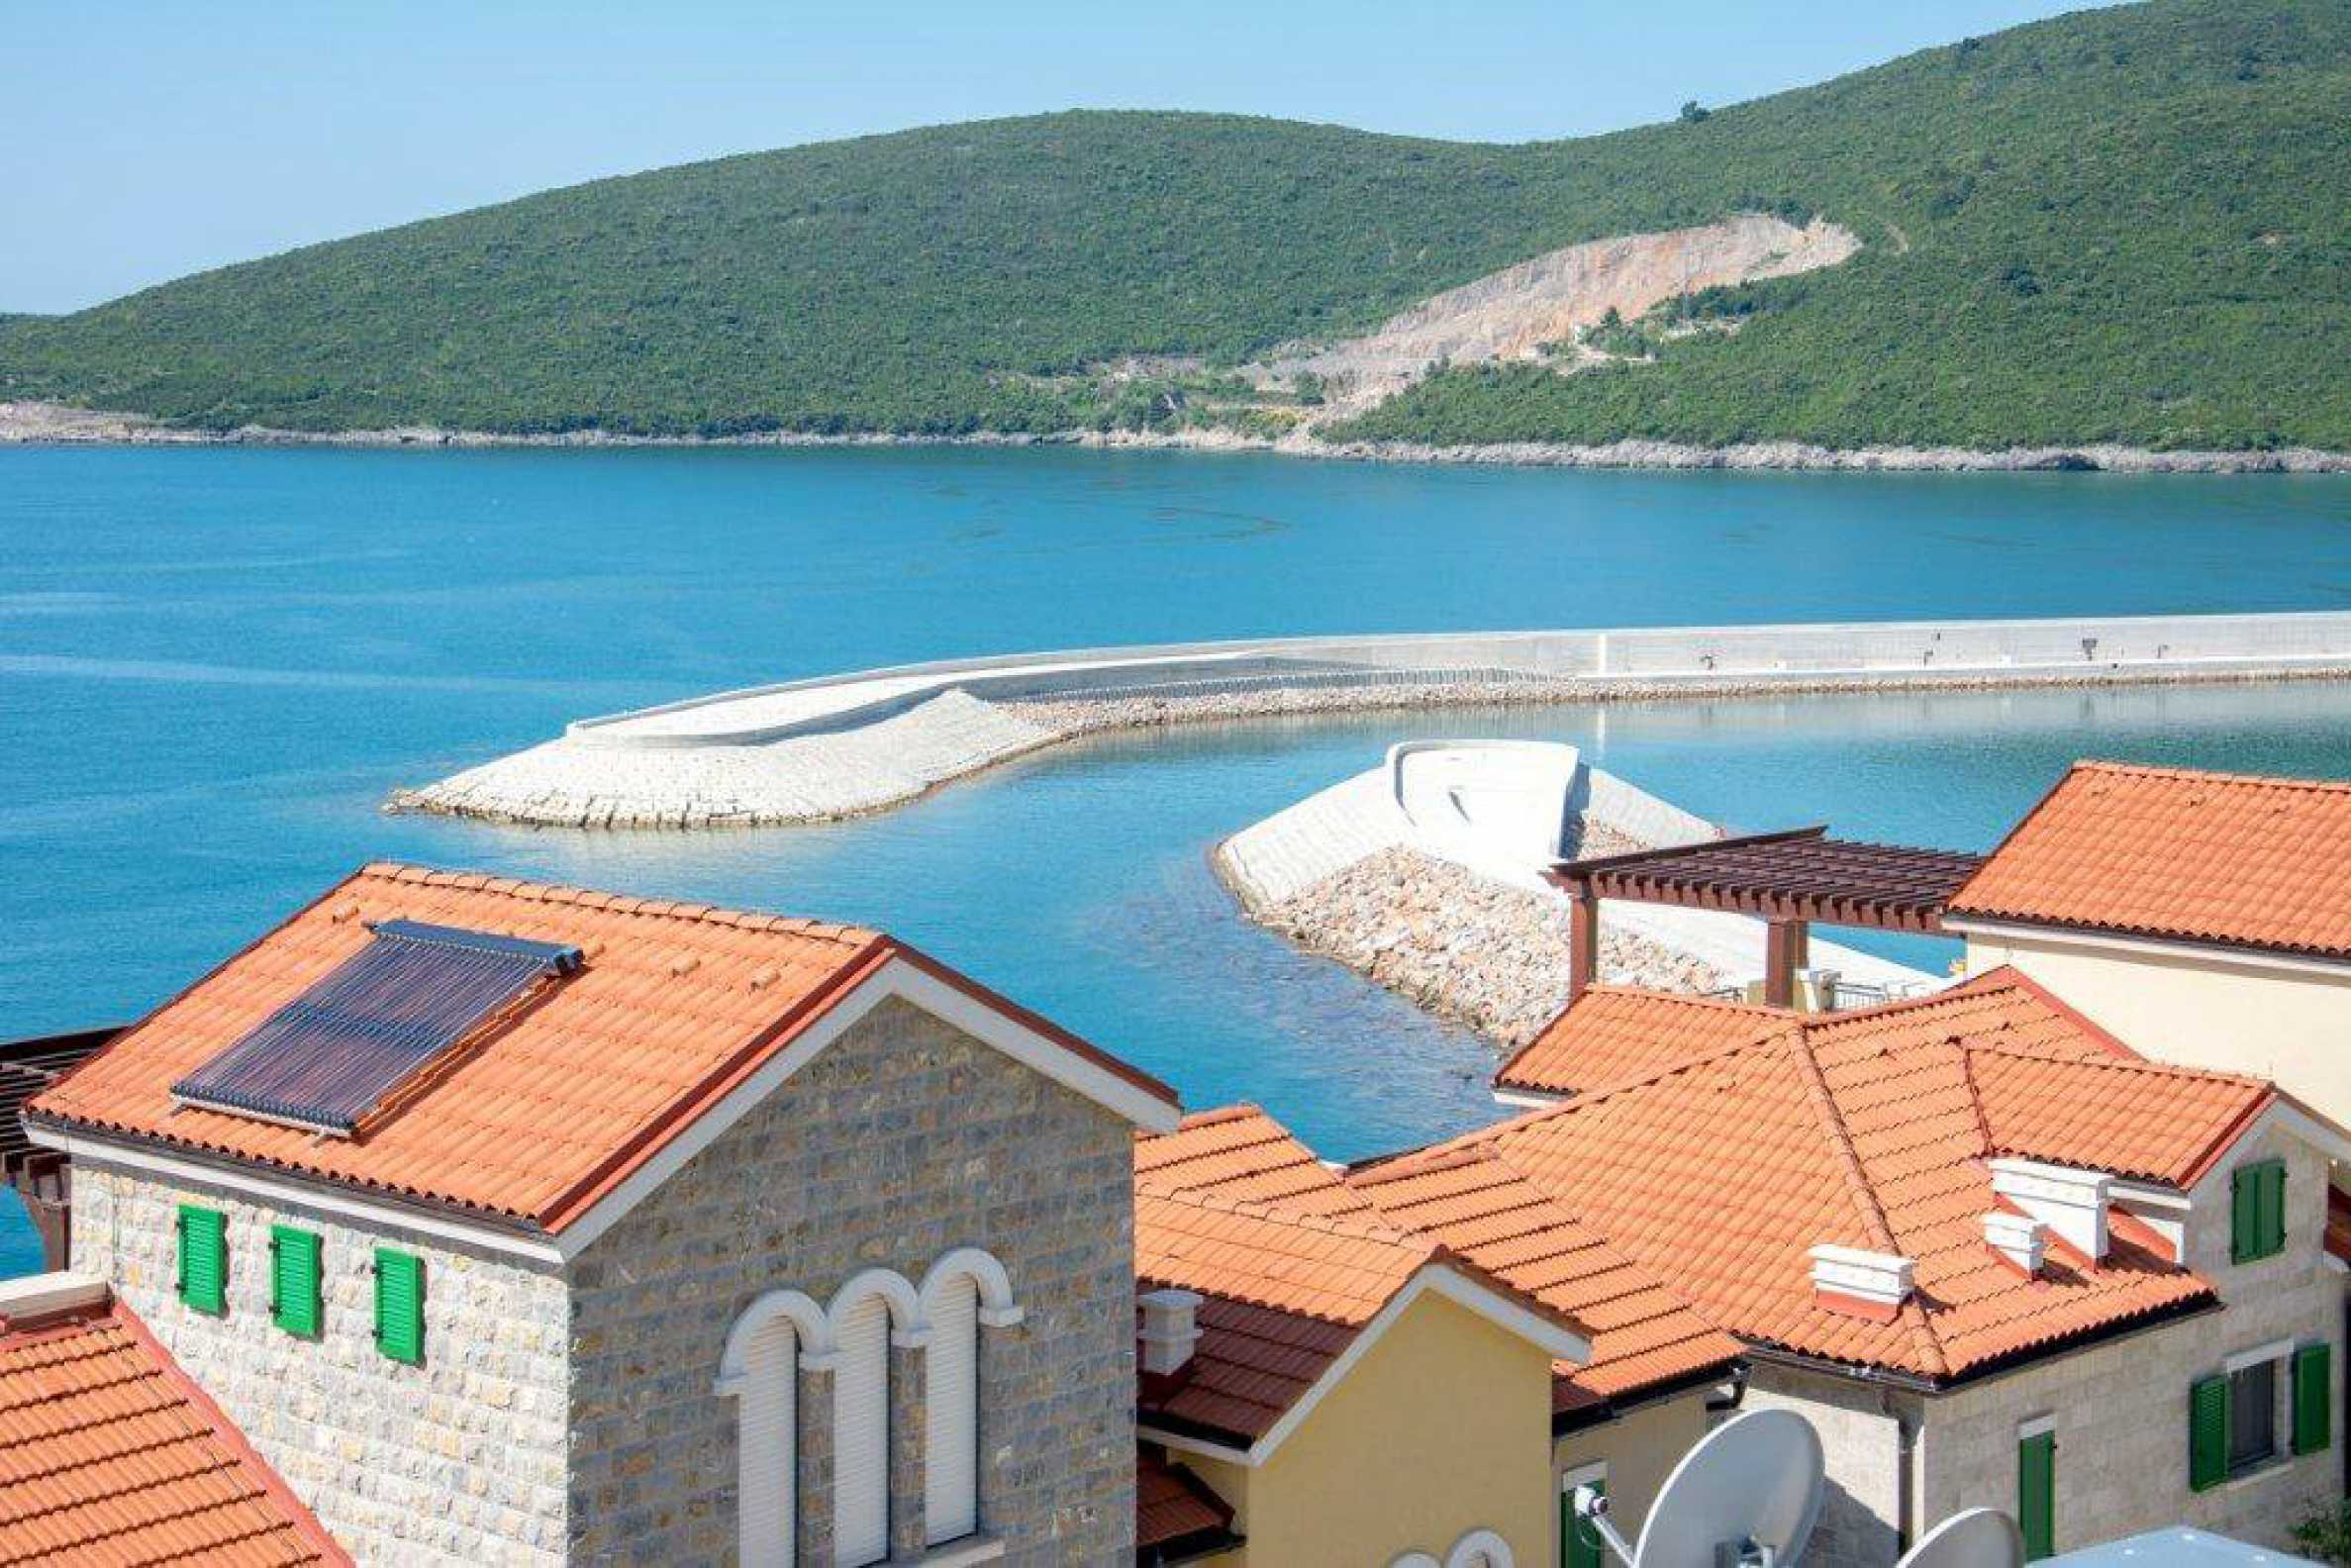 Apartments in world-class luxury resort on the Adriatic coast2 - Stonehard